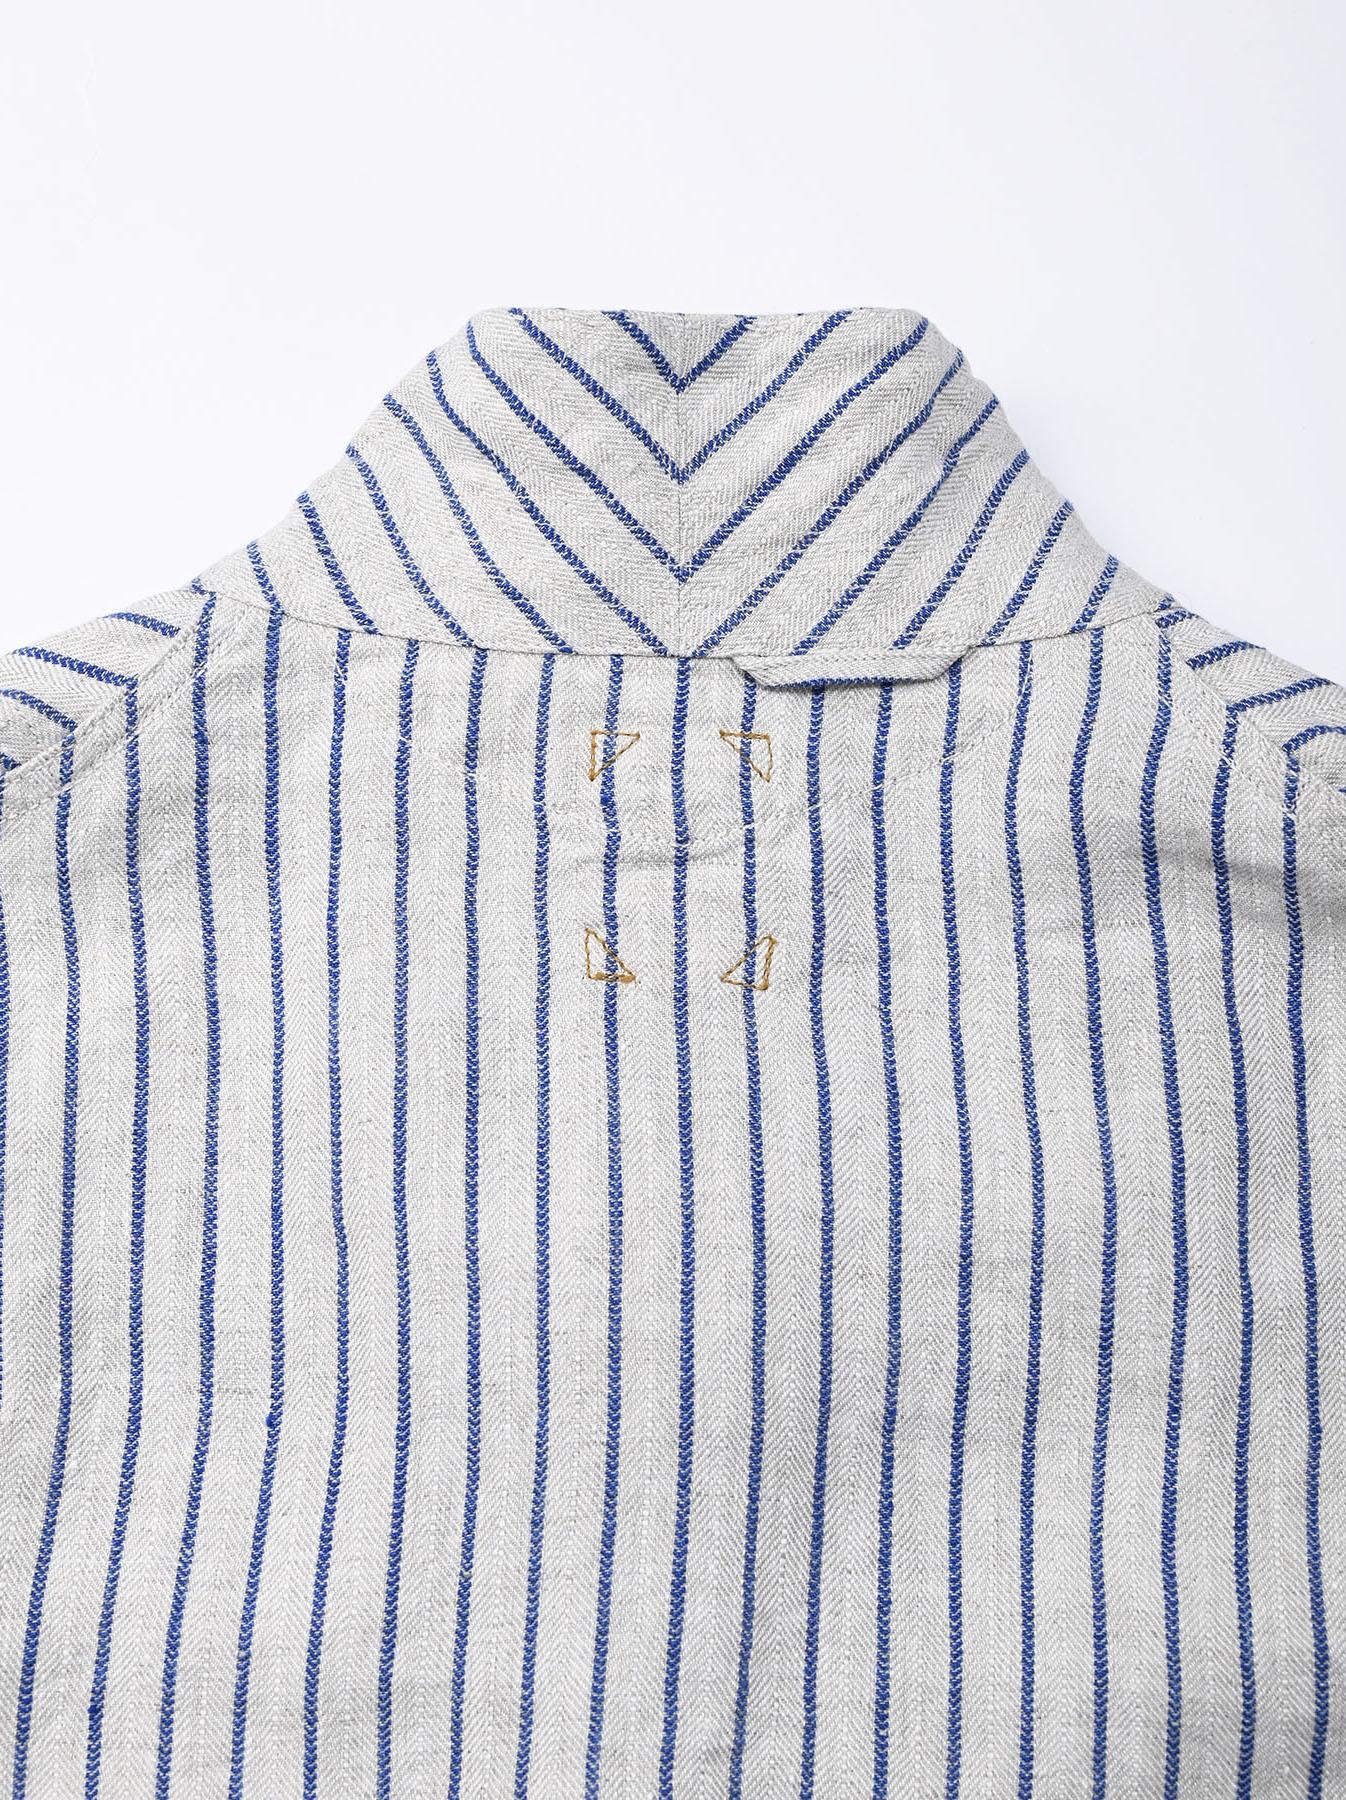 Indian Linen Twill Asama Jacket (0521)-8